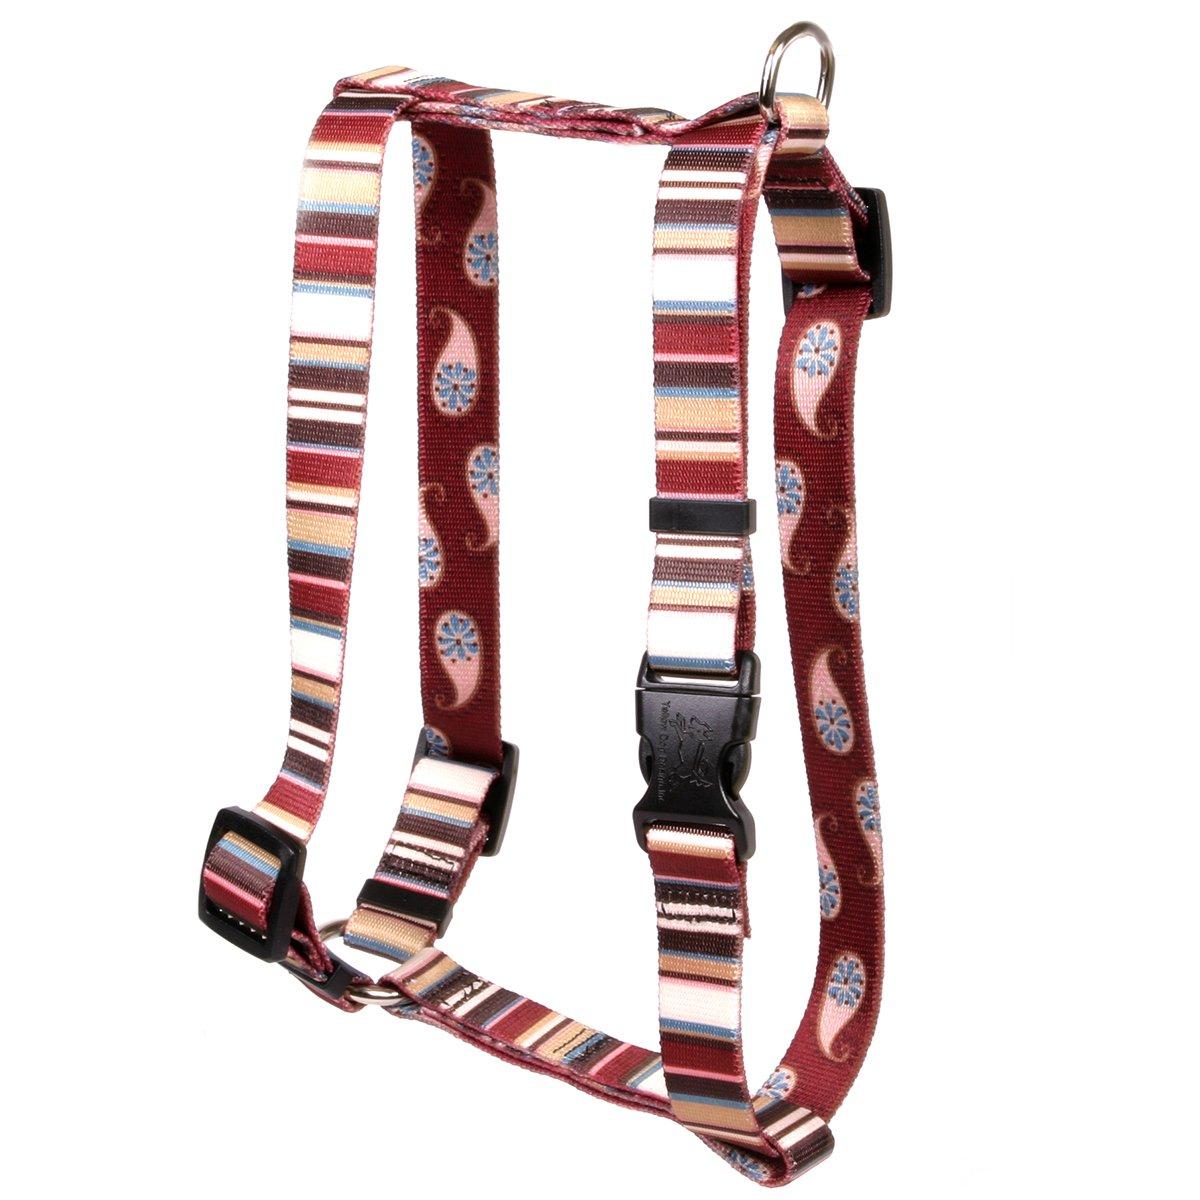 Large 20\ Yellow Dog Design Burgundy Stripes Roman Style H  Dog Harness, Large